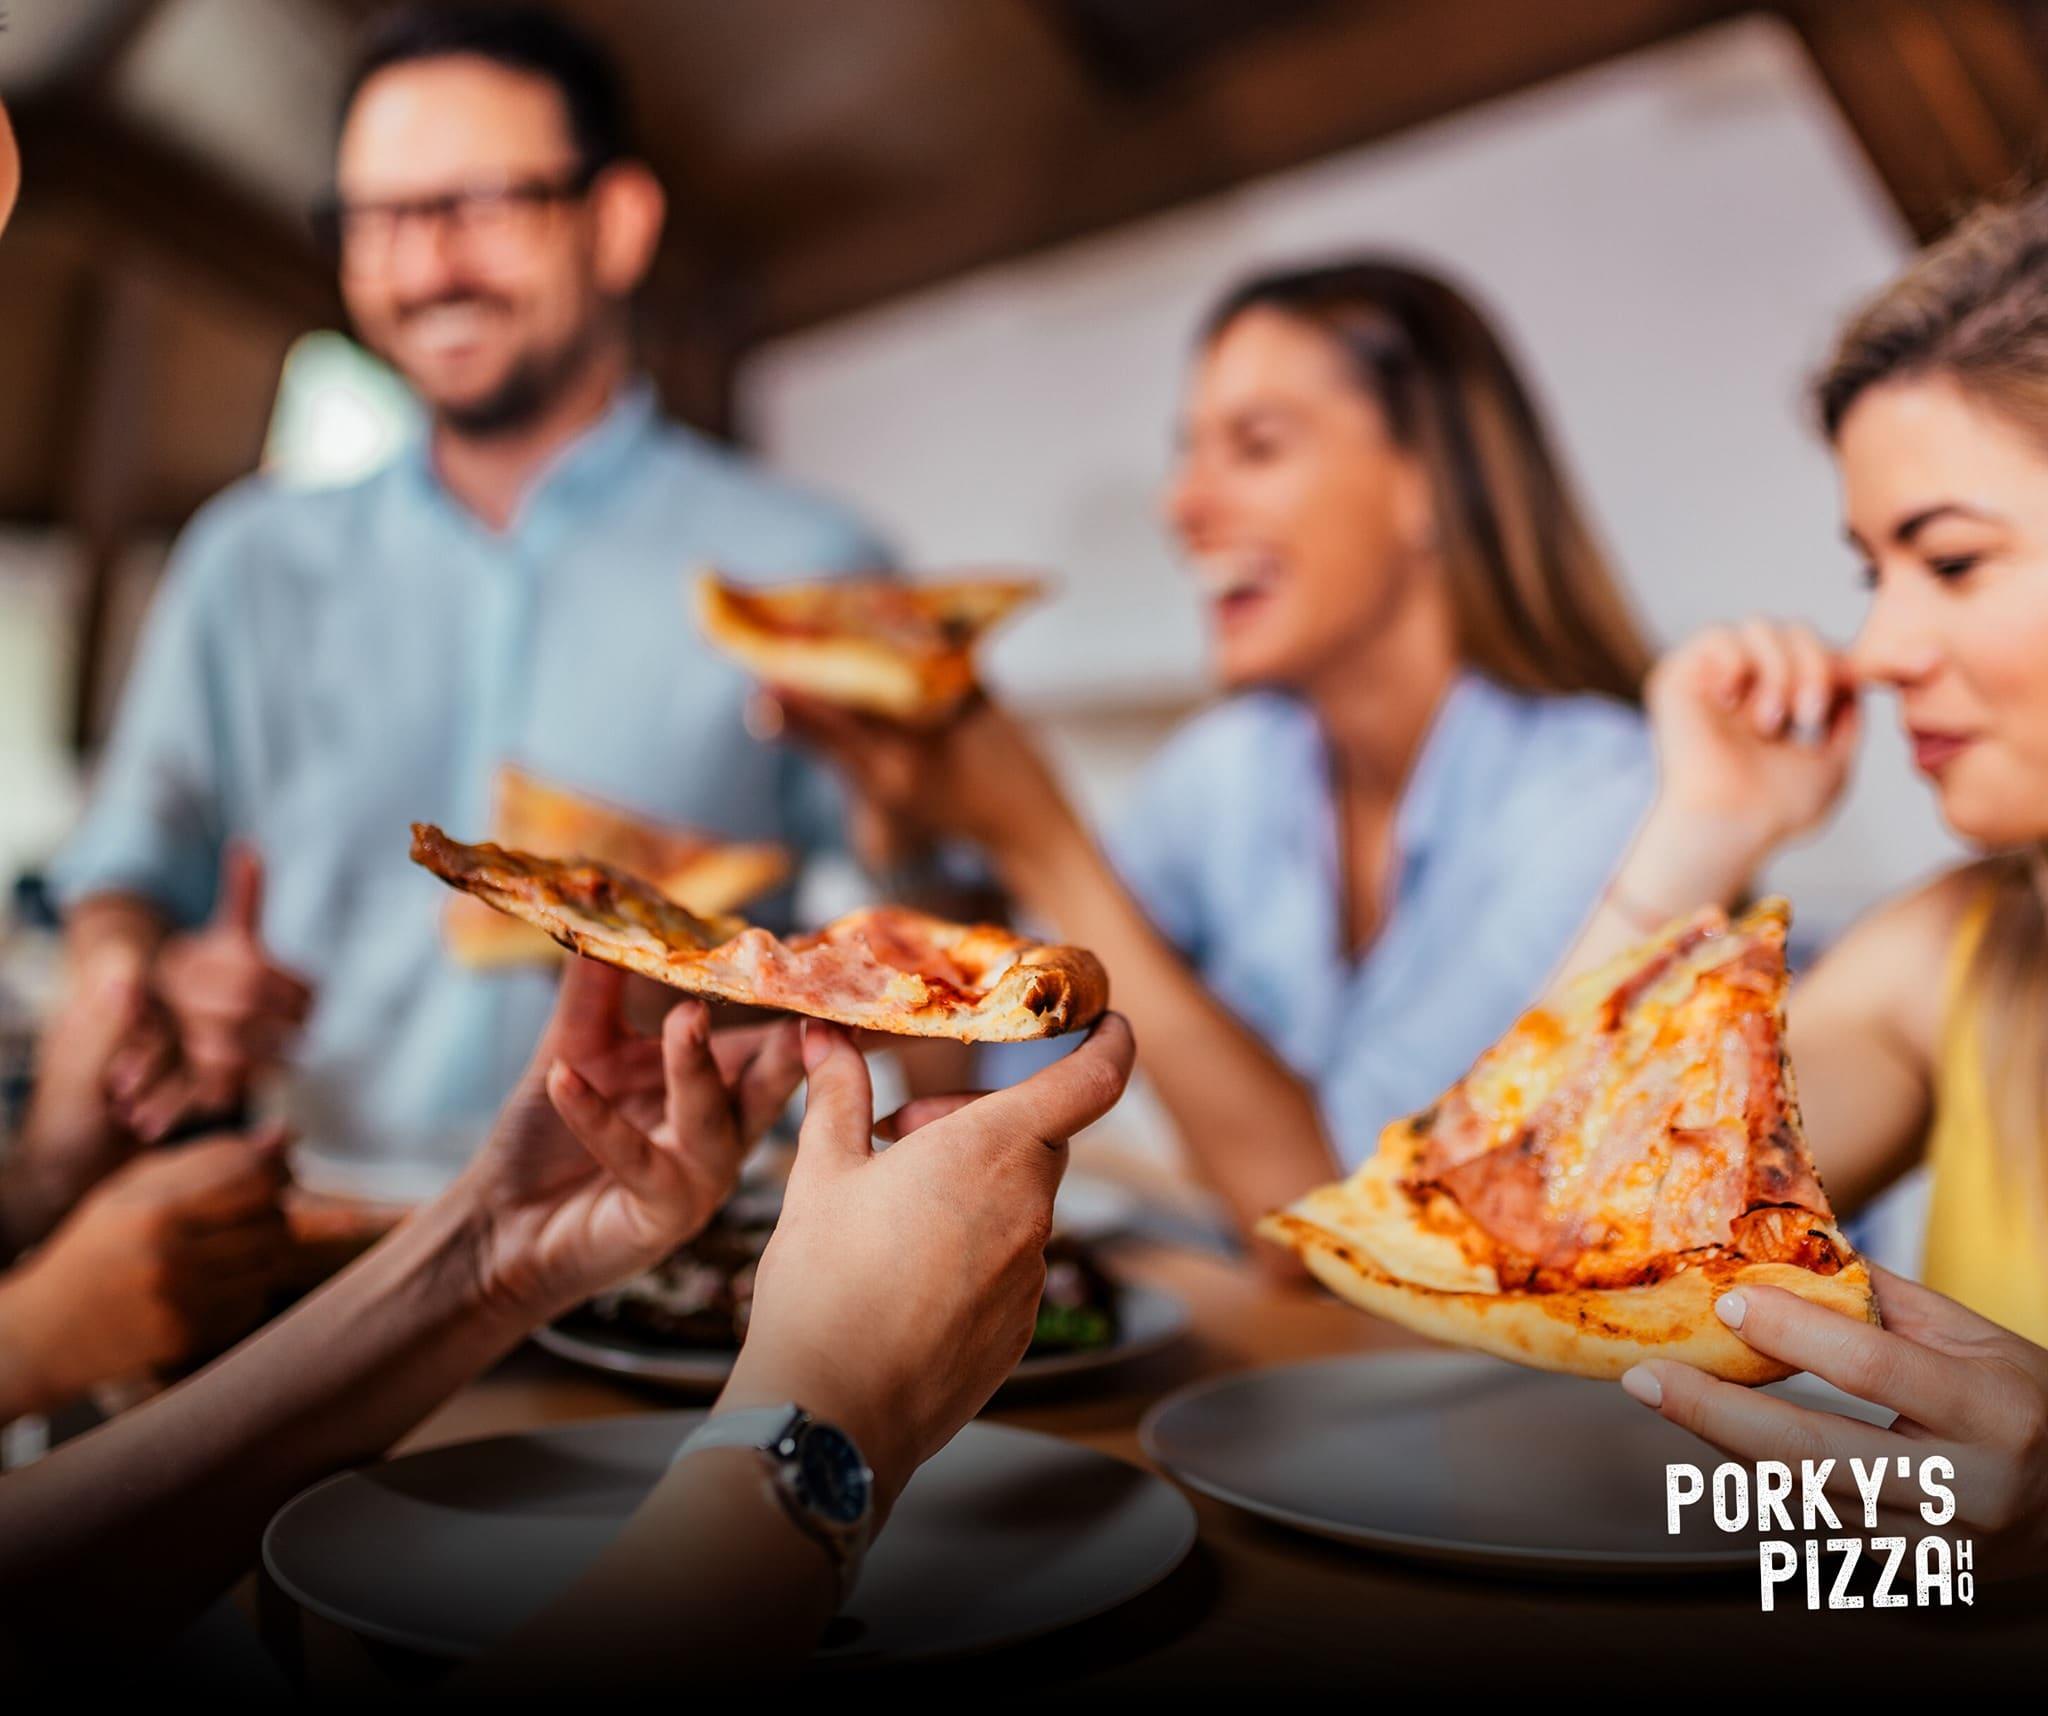 Porky's Pizza HQ